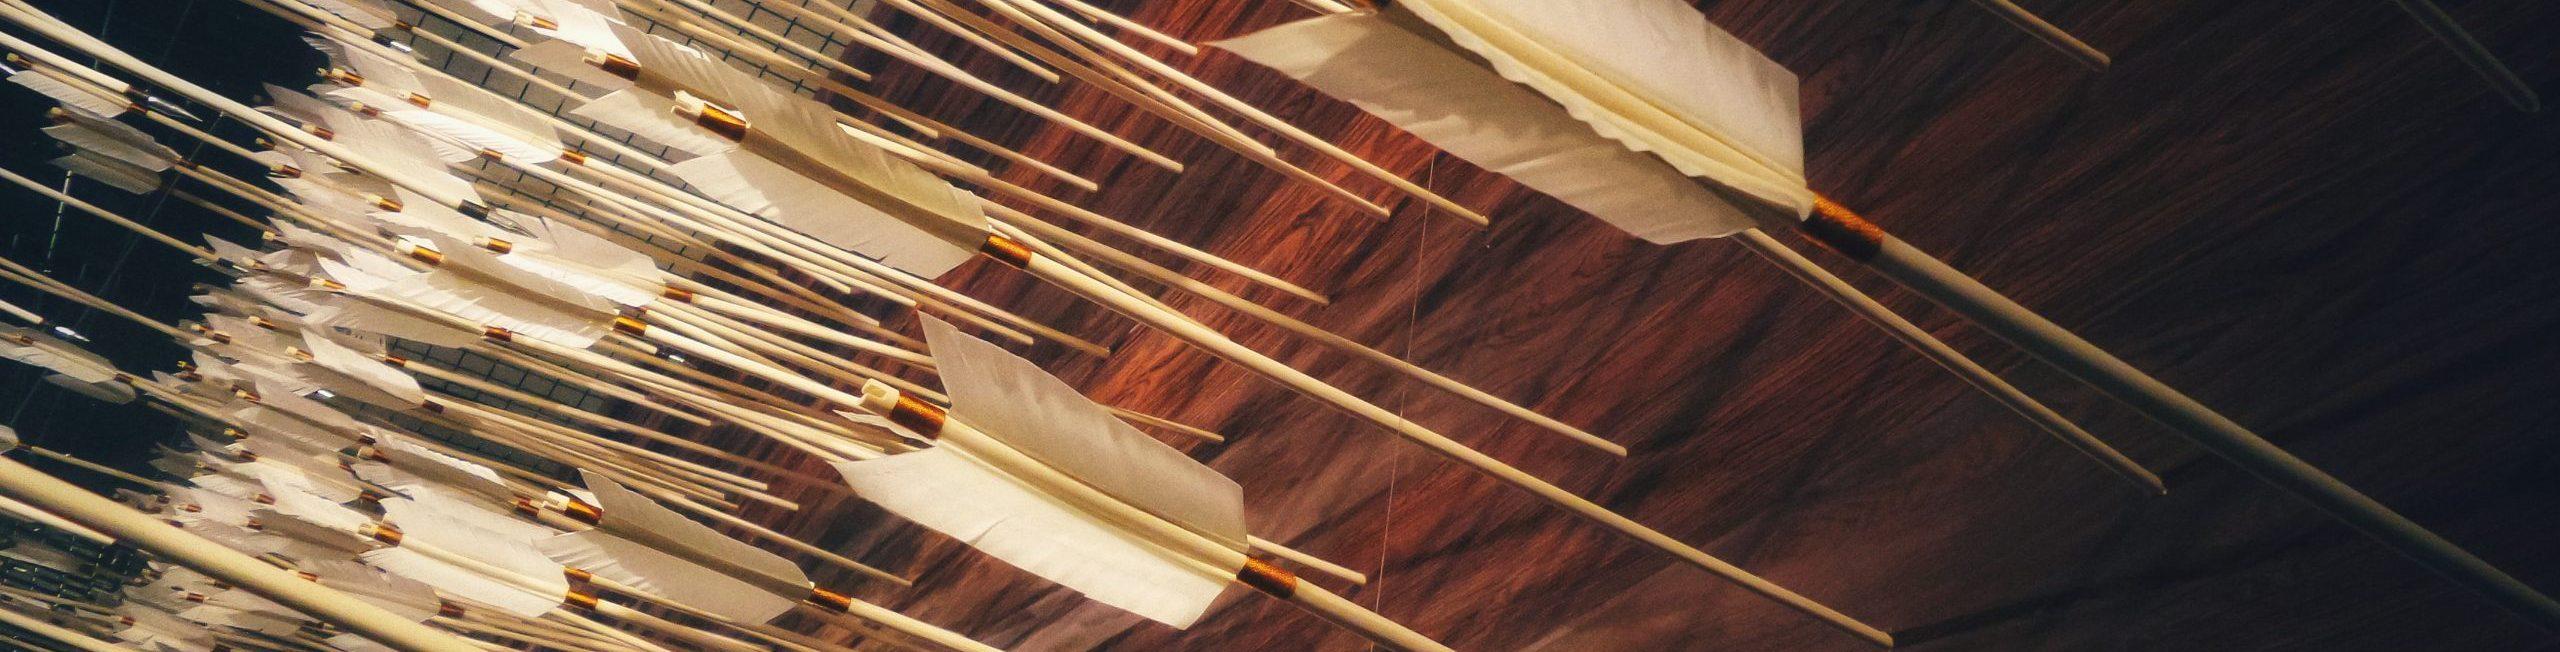 Archery Lessons in Columbia / Irmo, SC area